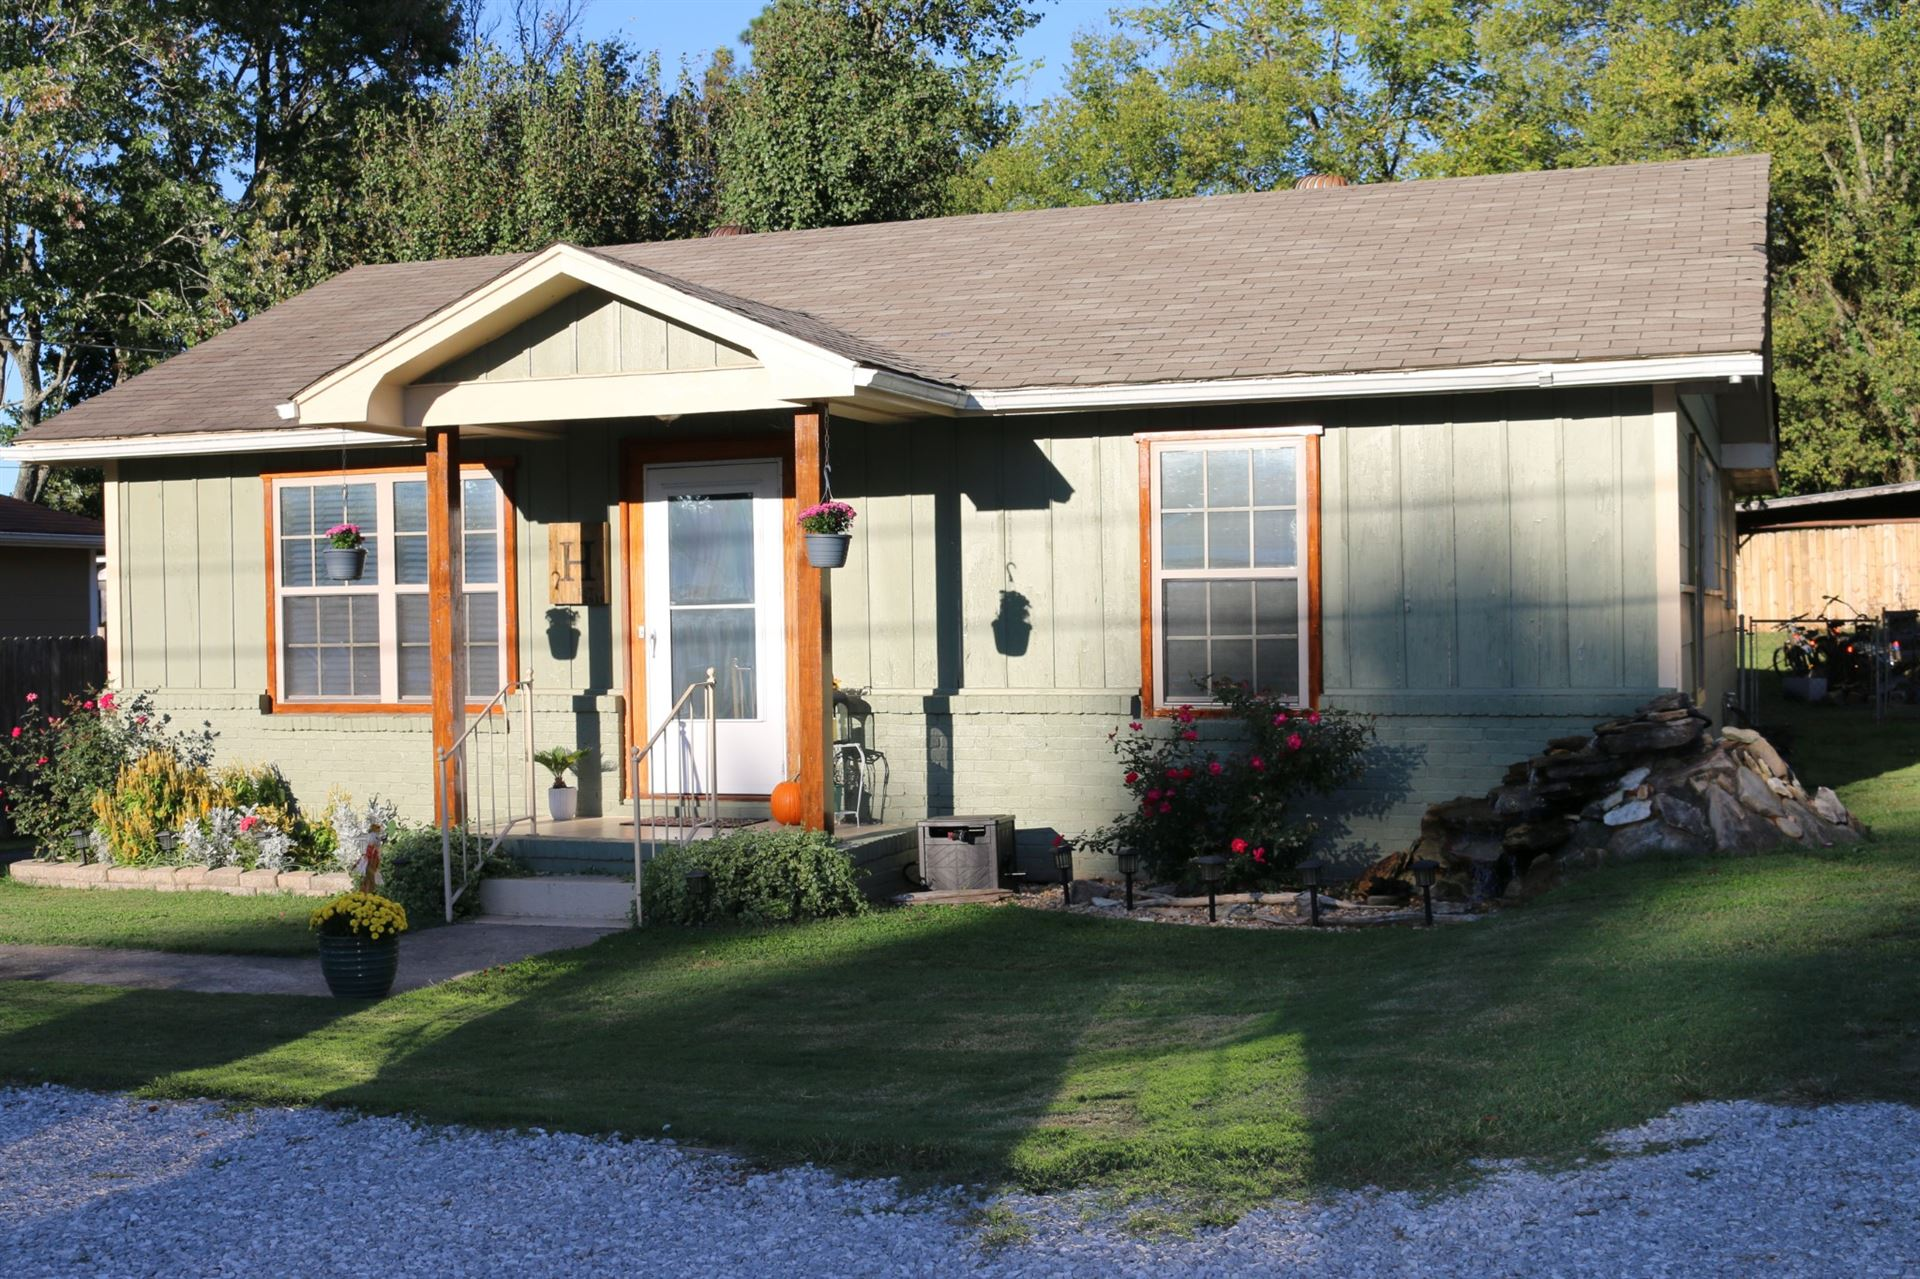 714 N Vine St, Winchester, TN 37398 - MLS#: 2293965